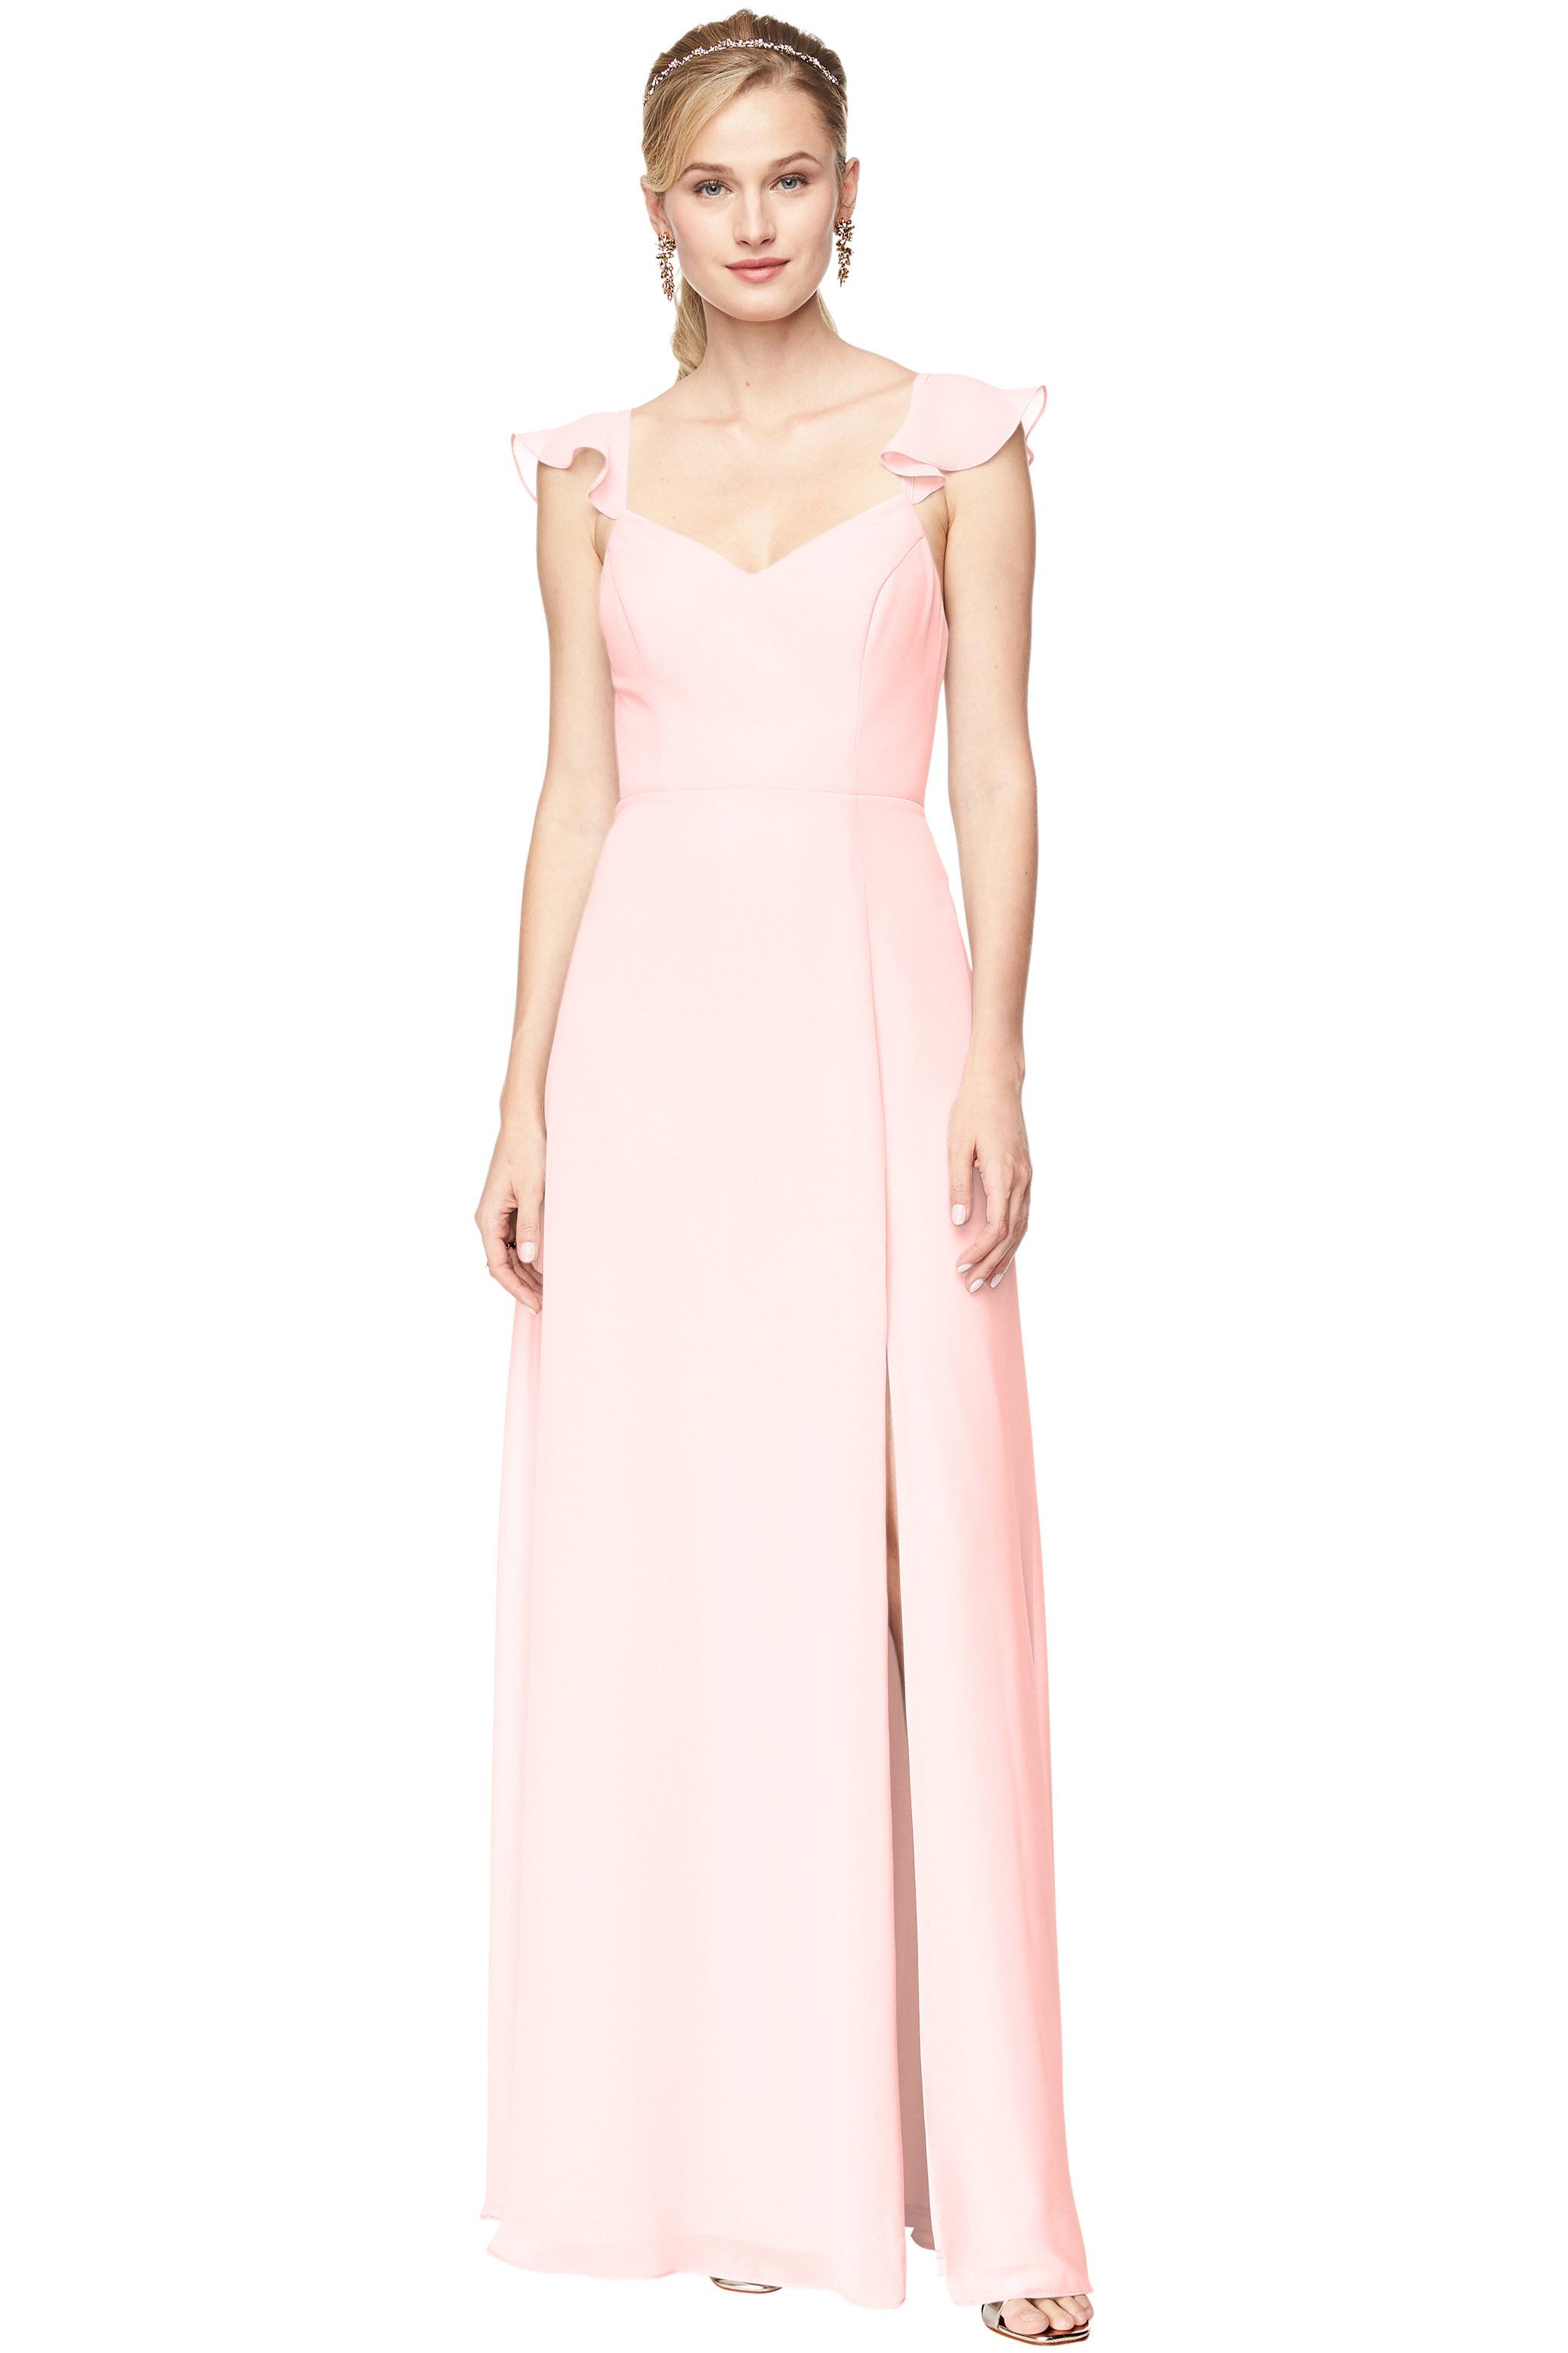 Bill Levkoff PETAL PINK Chiffon V-Neck, Cap Sleeve A-line gown, $168.30 Front